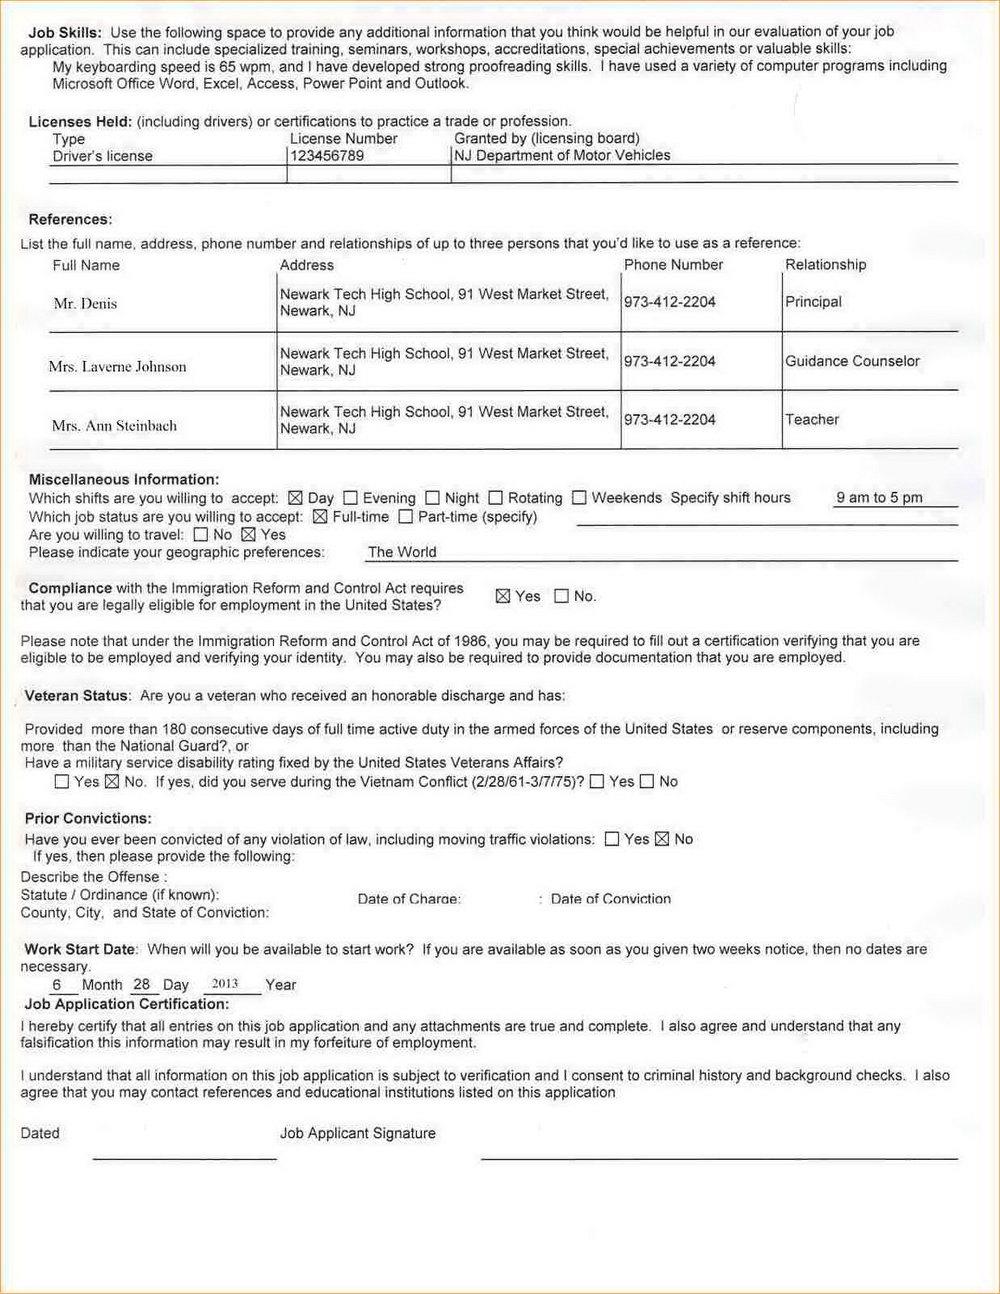 Job Application Cover Letter For Usps